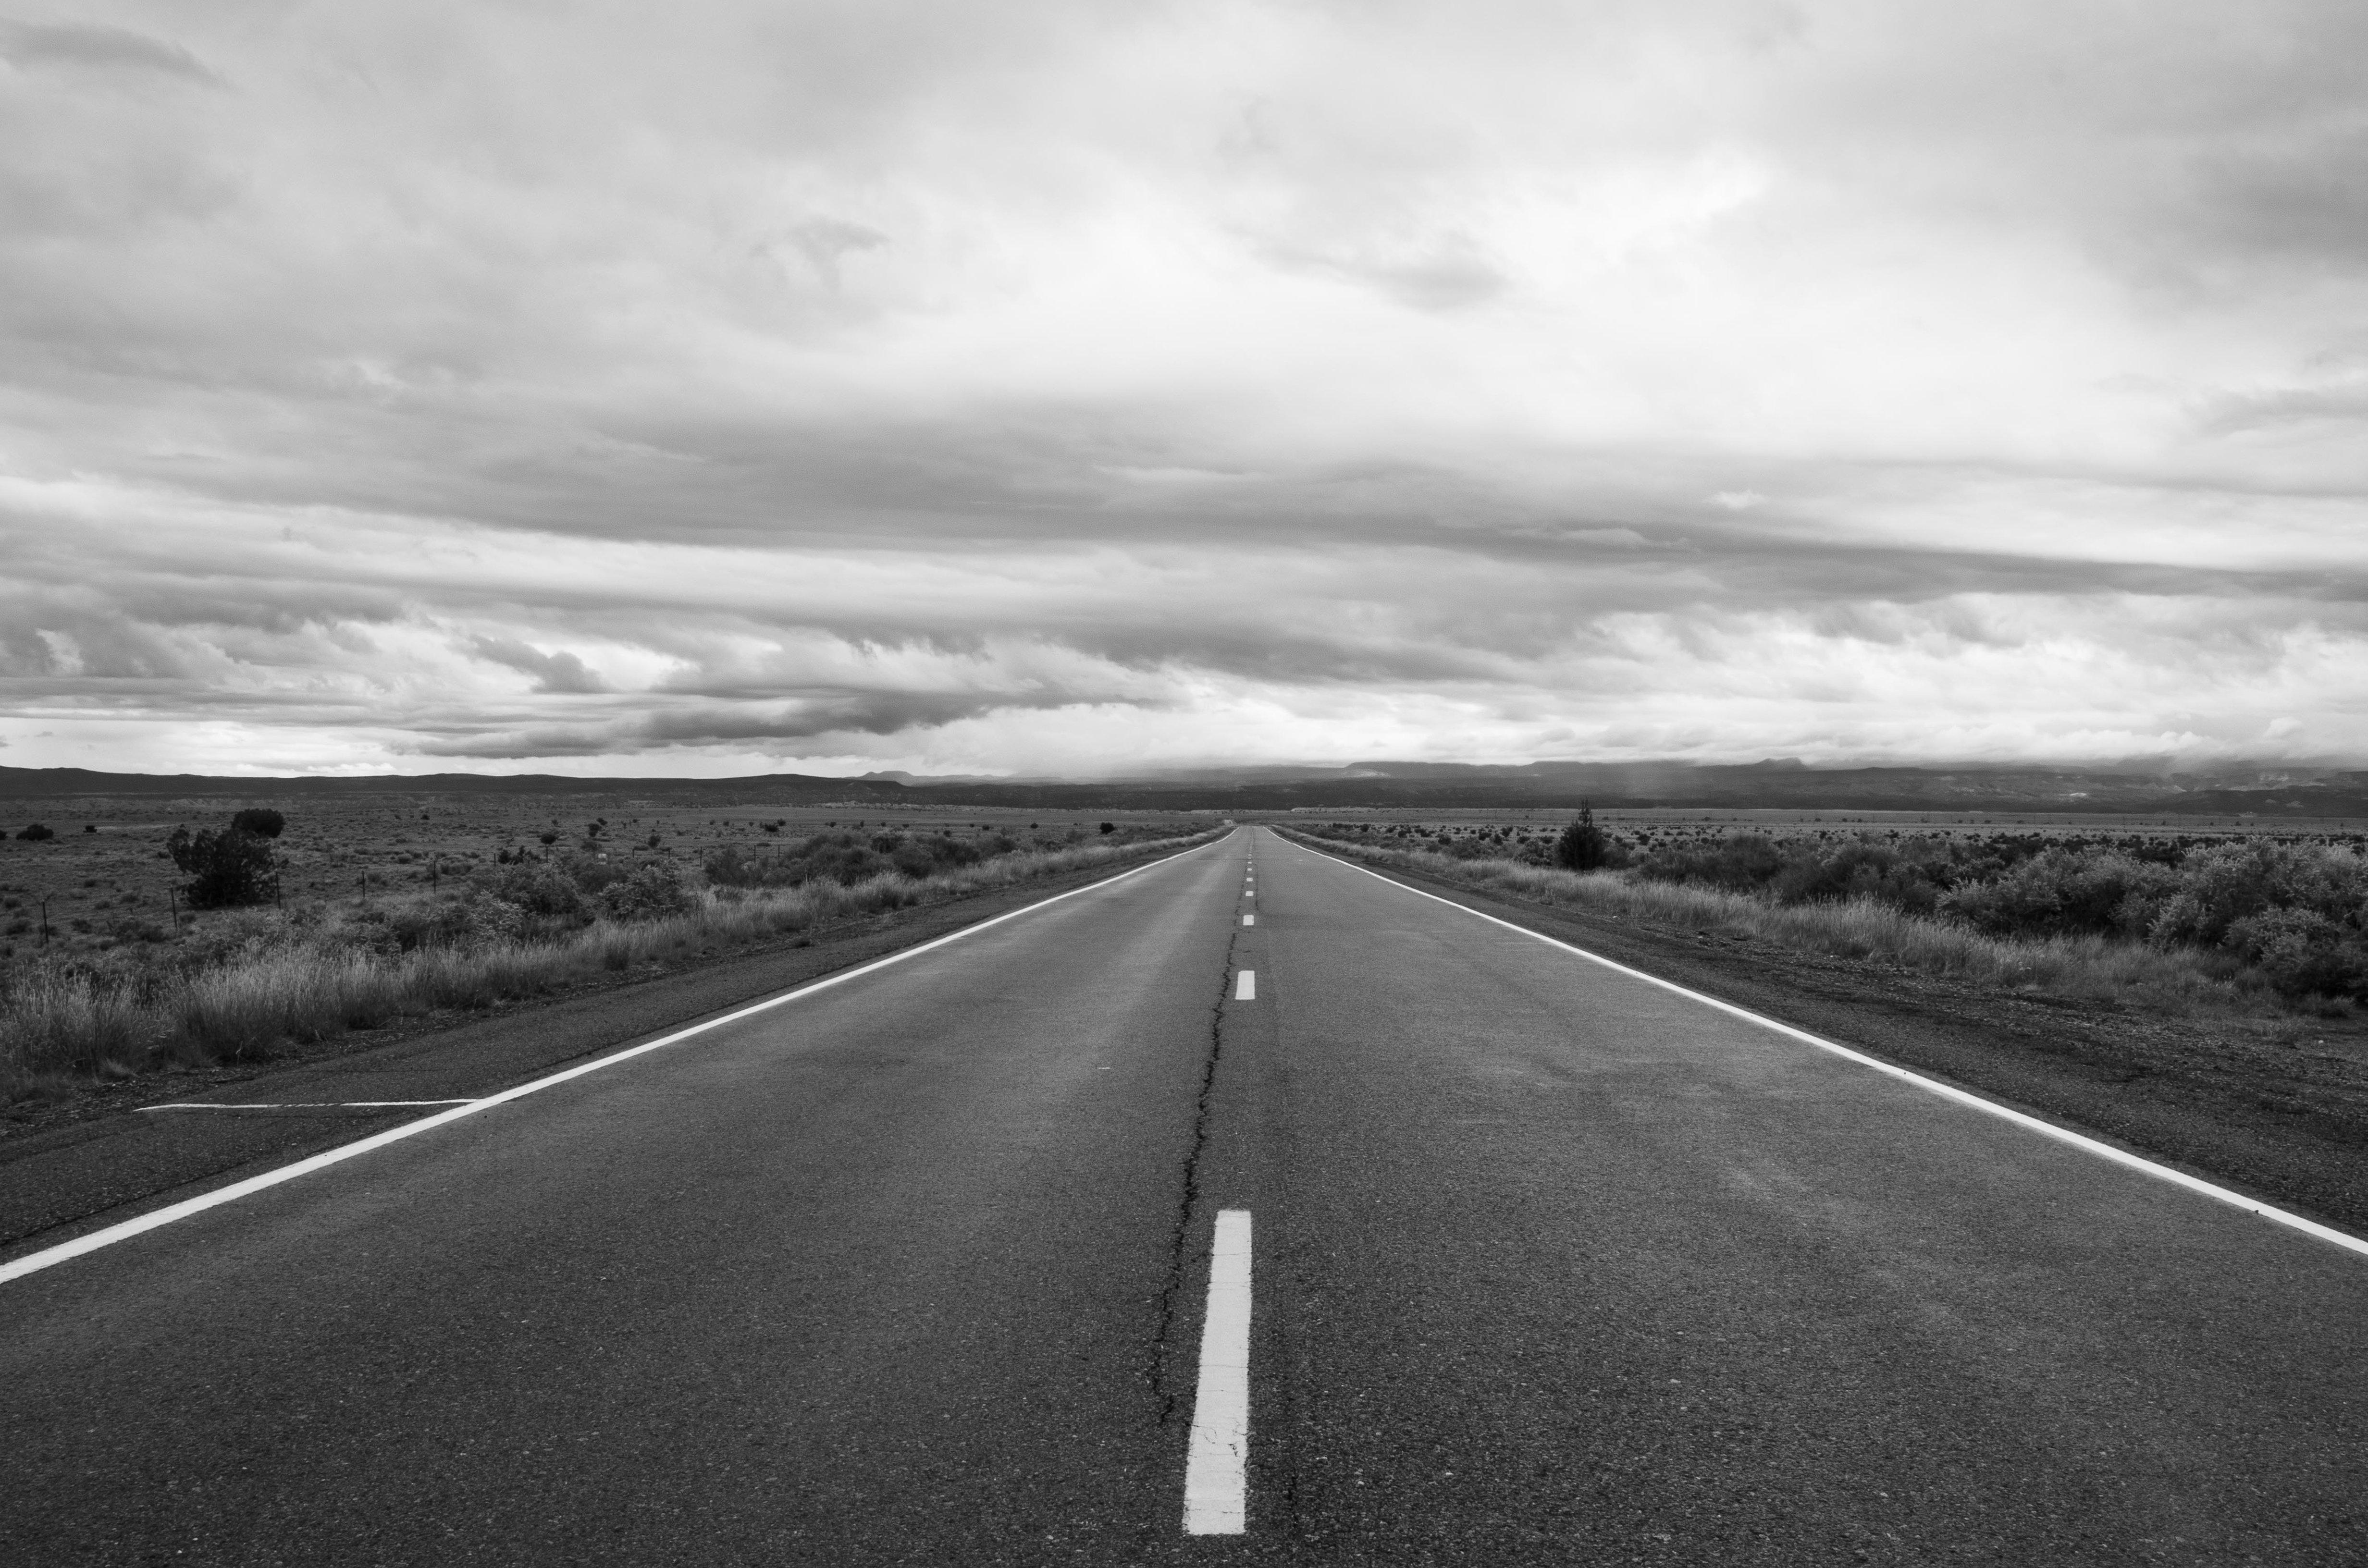 endless-highway_t20_09Rld6-1